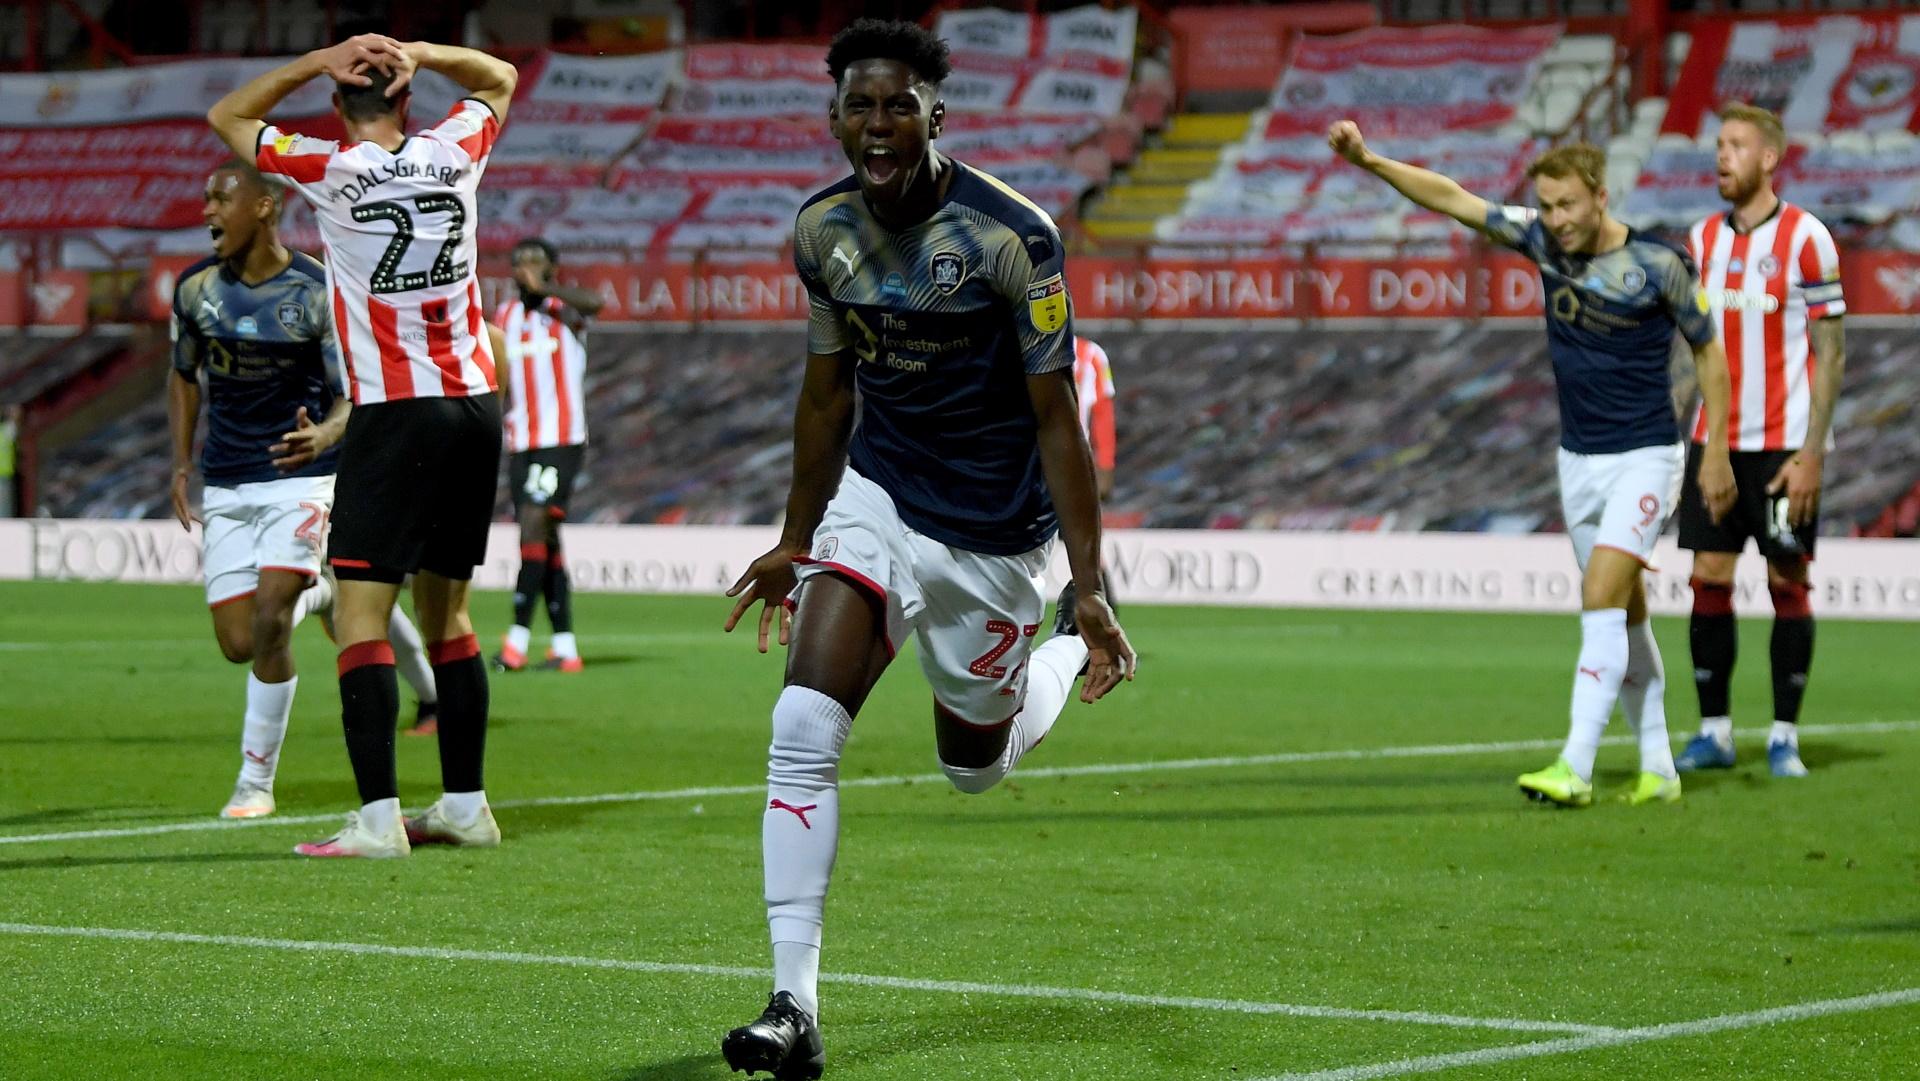 Kenya's Oduor strikes late to save Barnsley   Goal.com